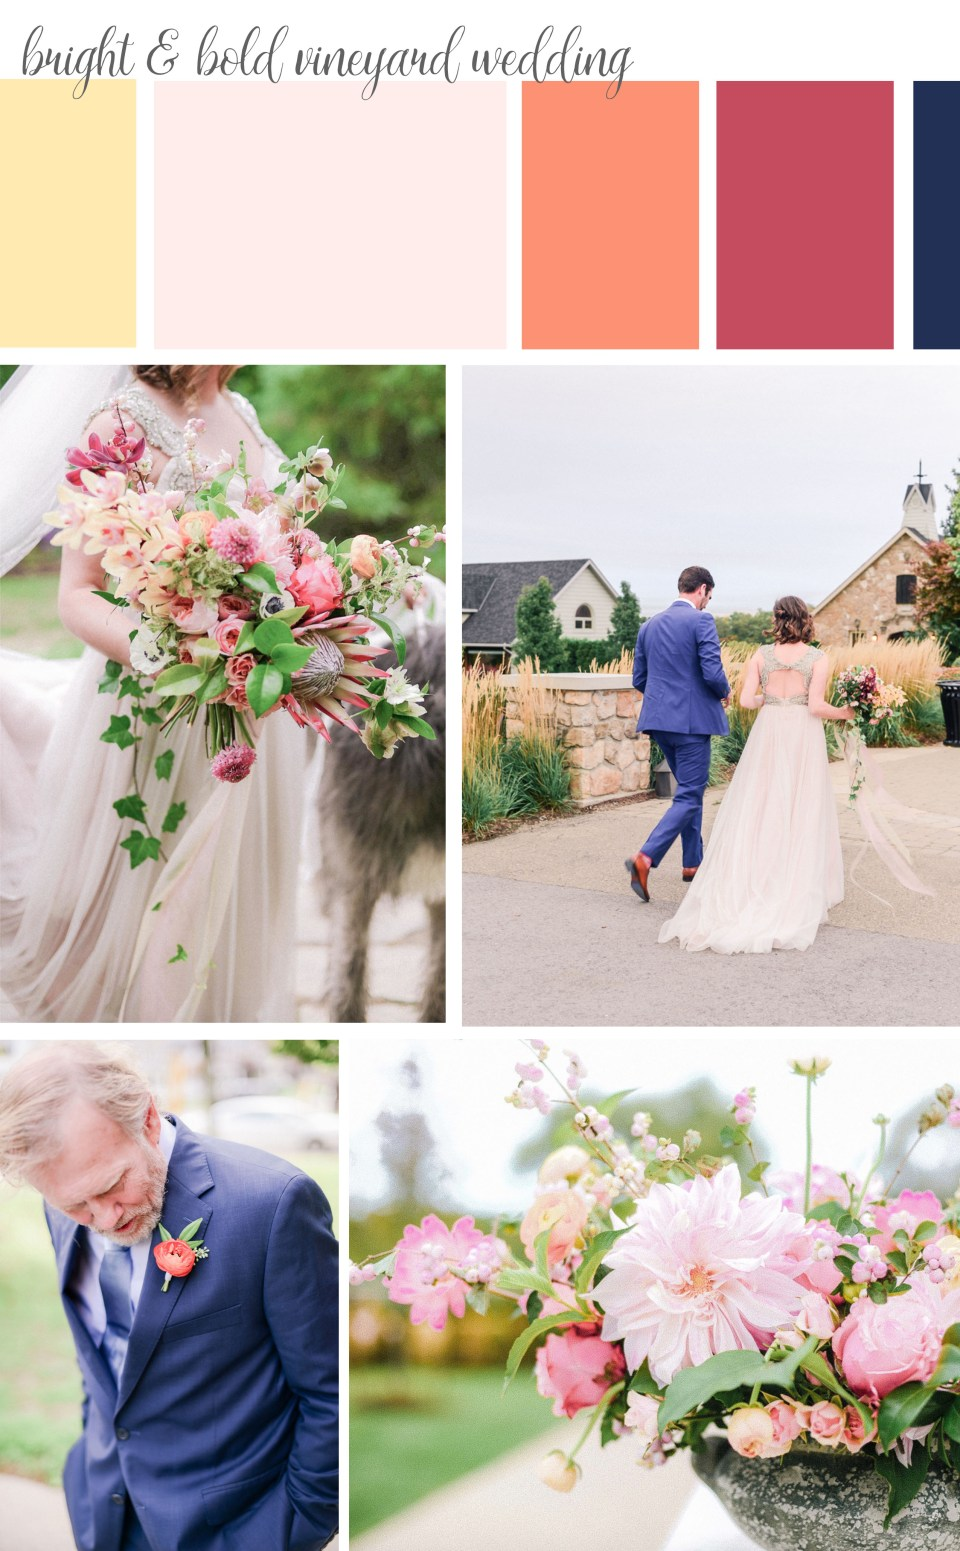 A vineyard wedding with a bright color palette   Niagara Wedding   Vineland Estates Wedding   Bold Wedding   Niagara Wedding Florist   Vineland Estates Wedding